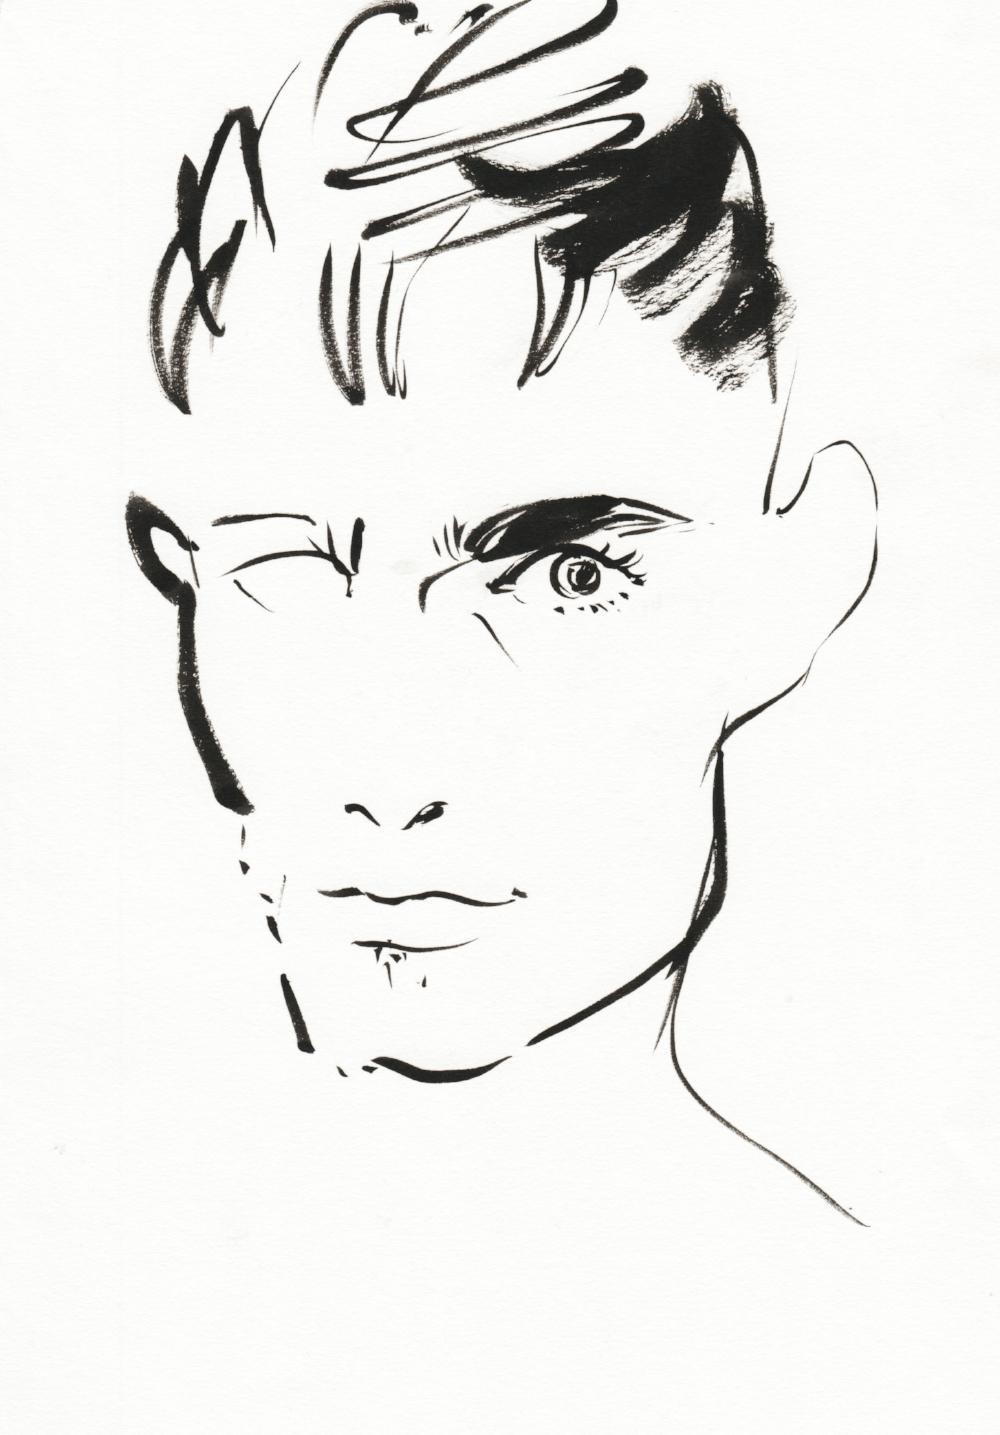 Joshua Osborn Self Portrait August 2018